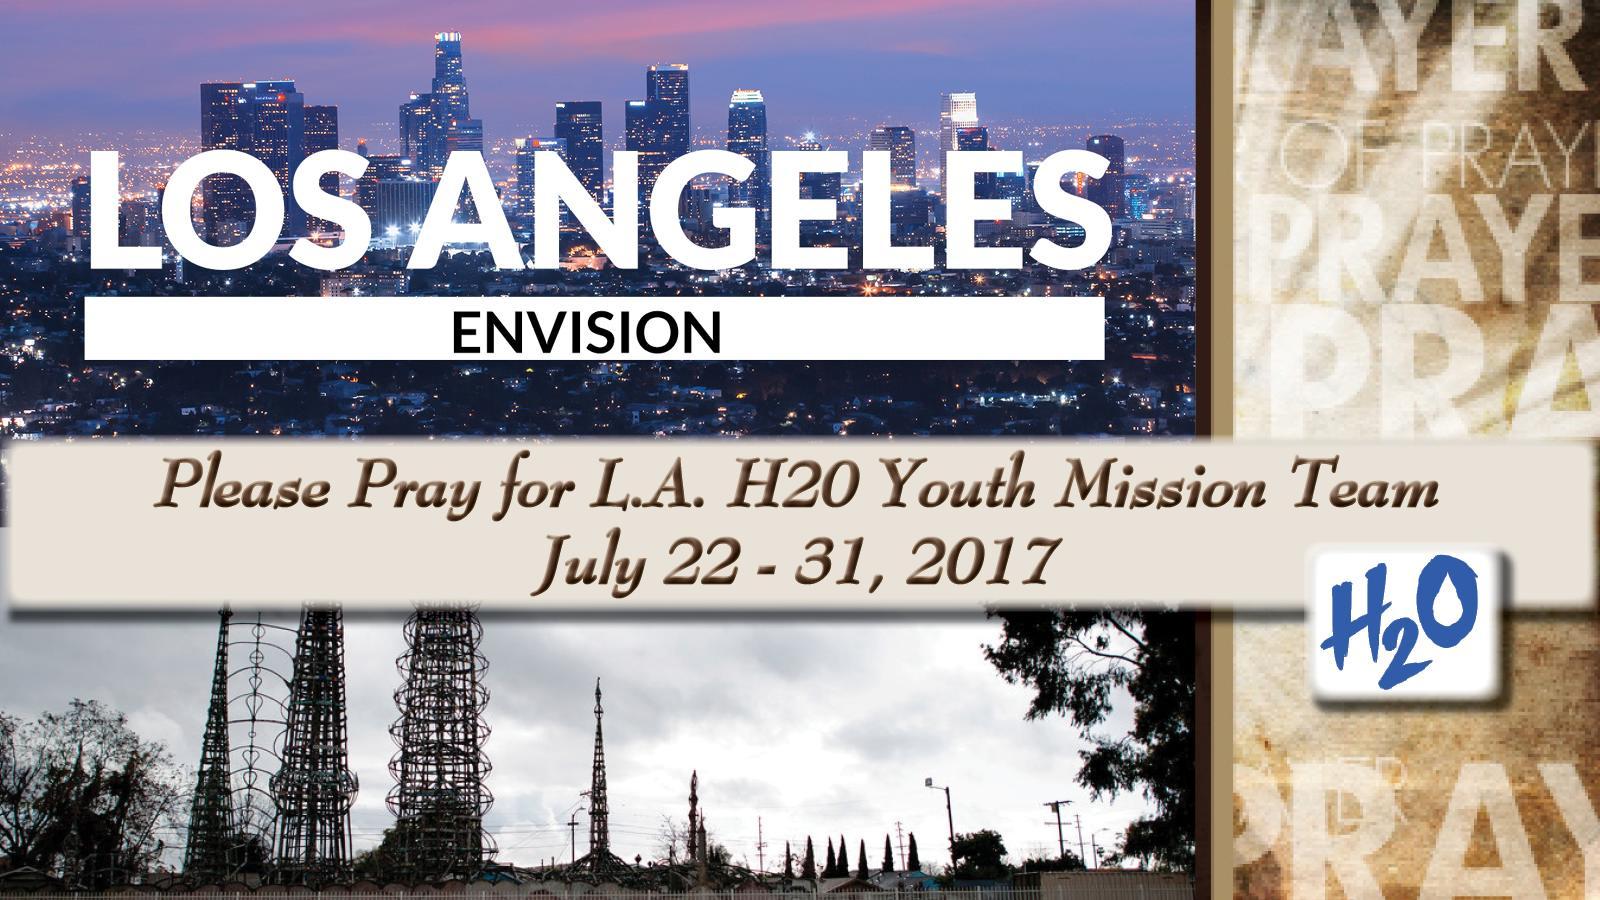 Los Angeles Envision